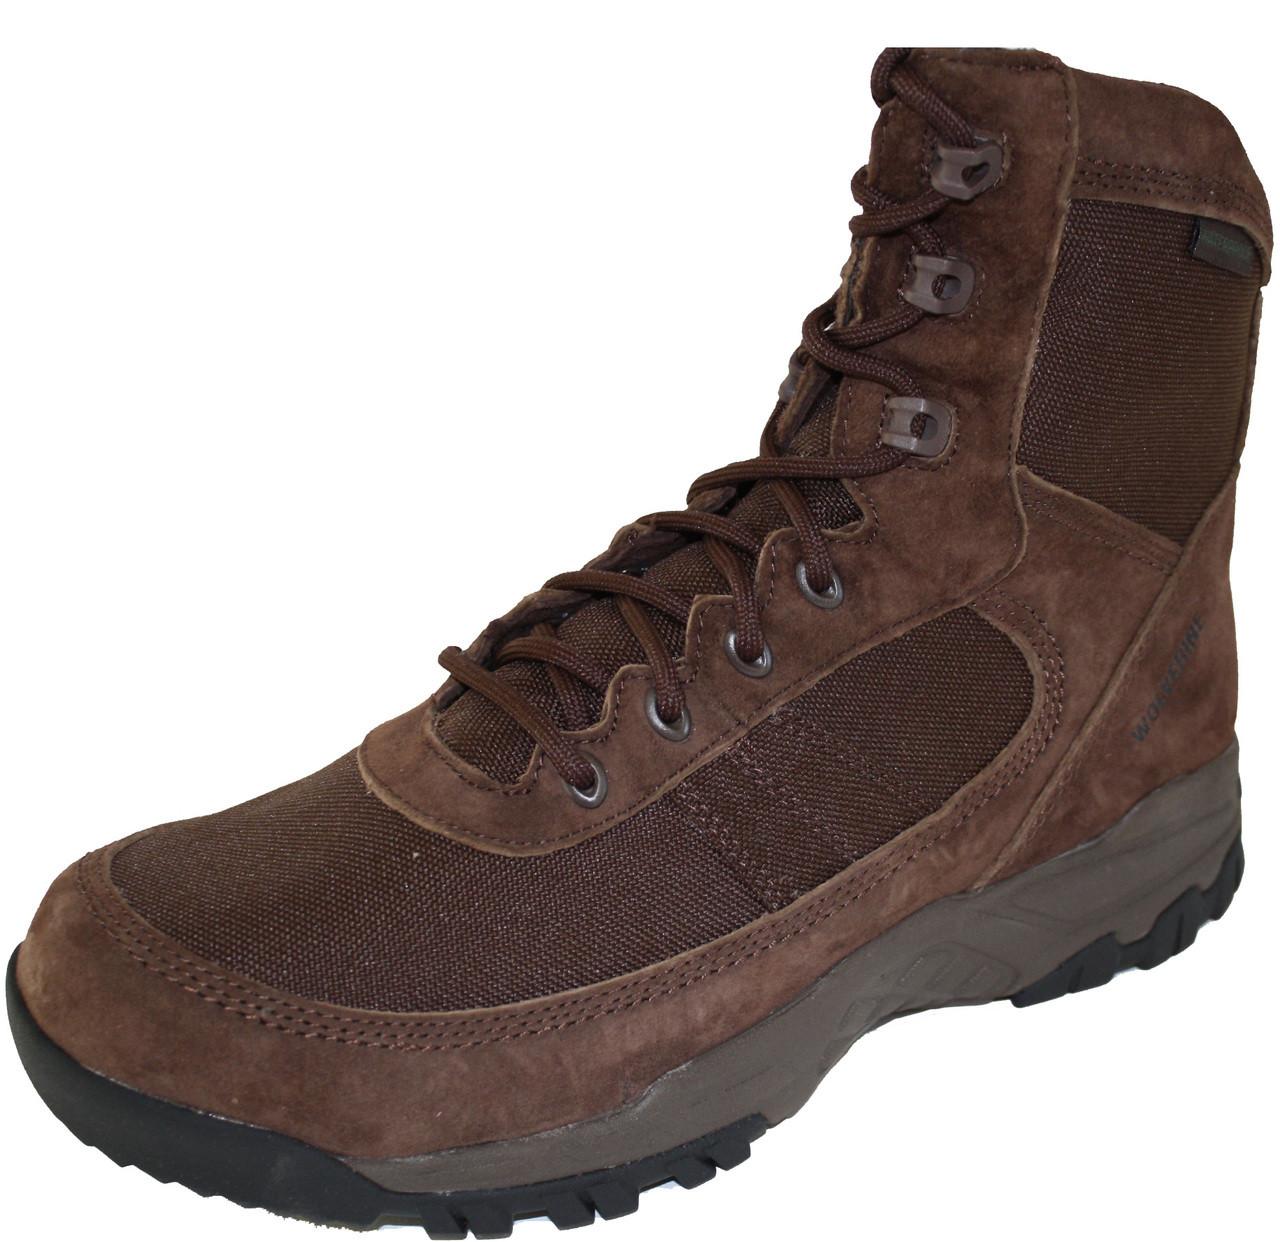 4d83af6dd90 Wolverine W30077 Mens Bobwhite Waterproof Realtree Brown 7 Inch Boot